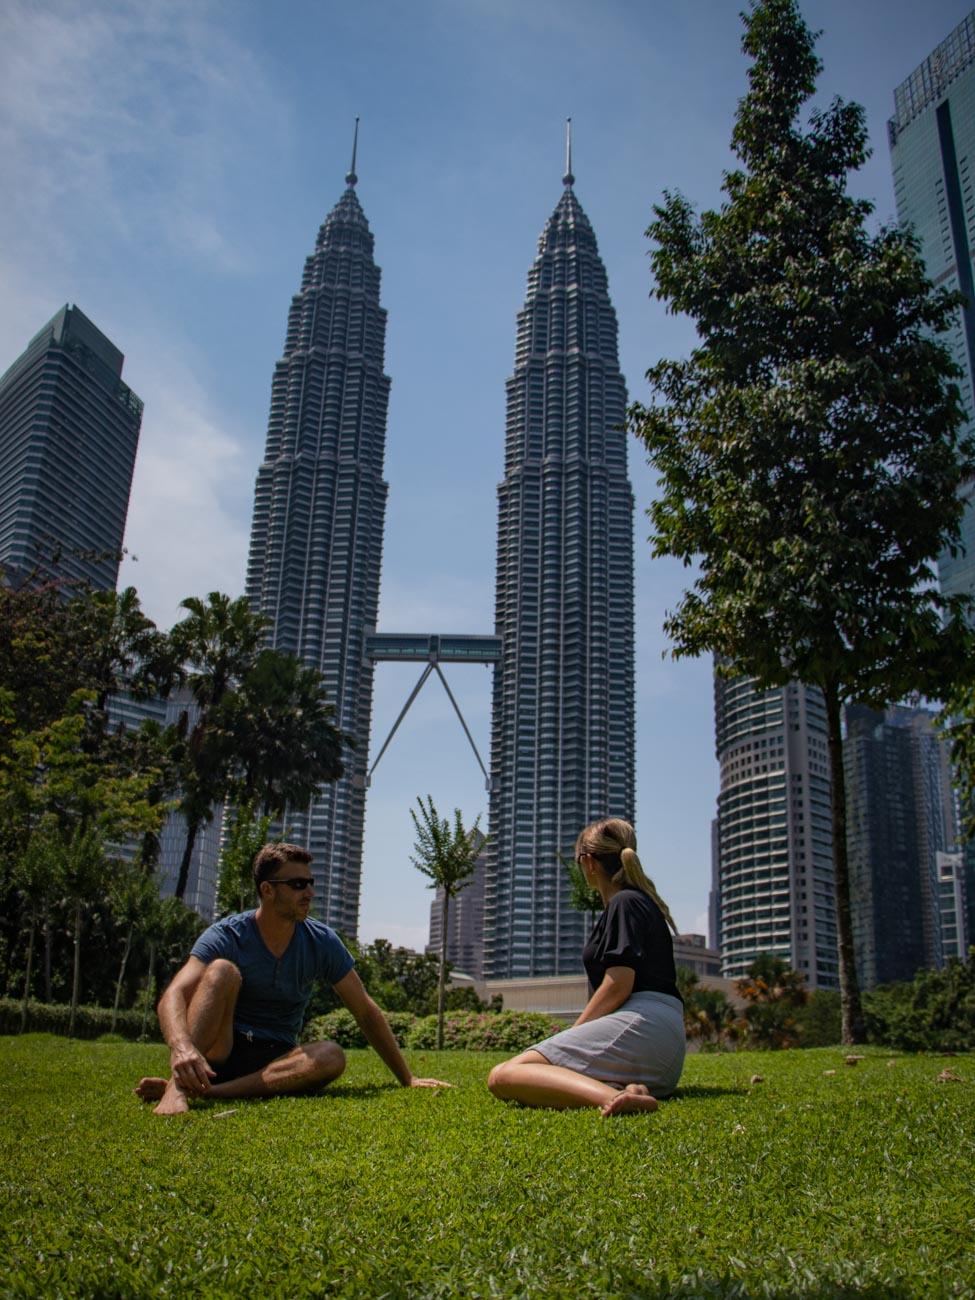 KLCC Park - things to do in Kuala Lumpur